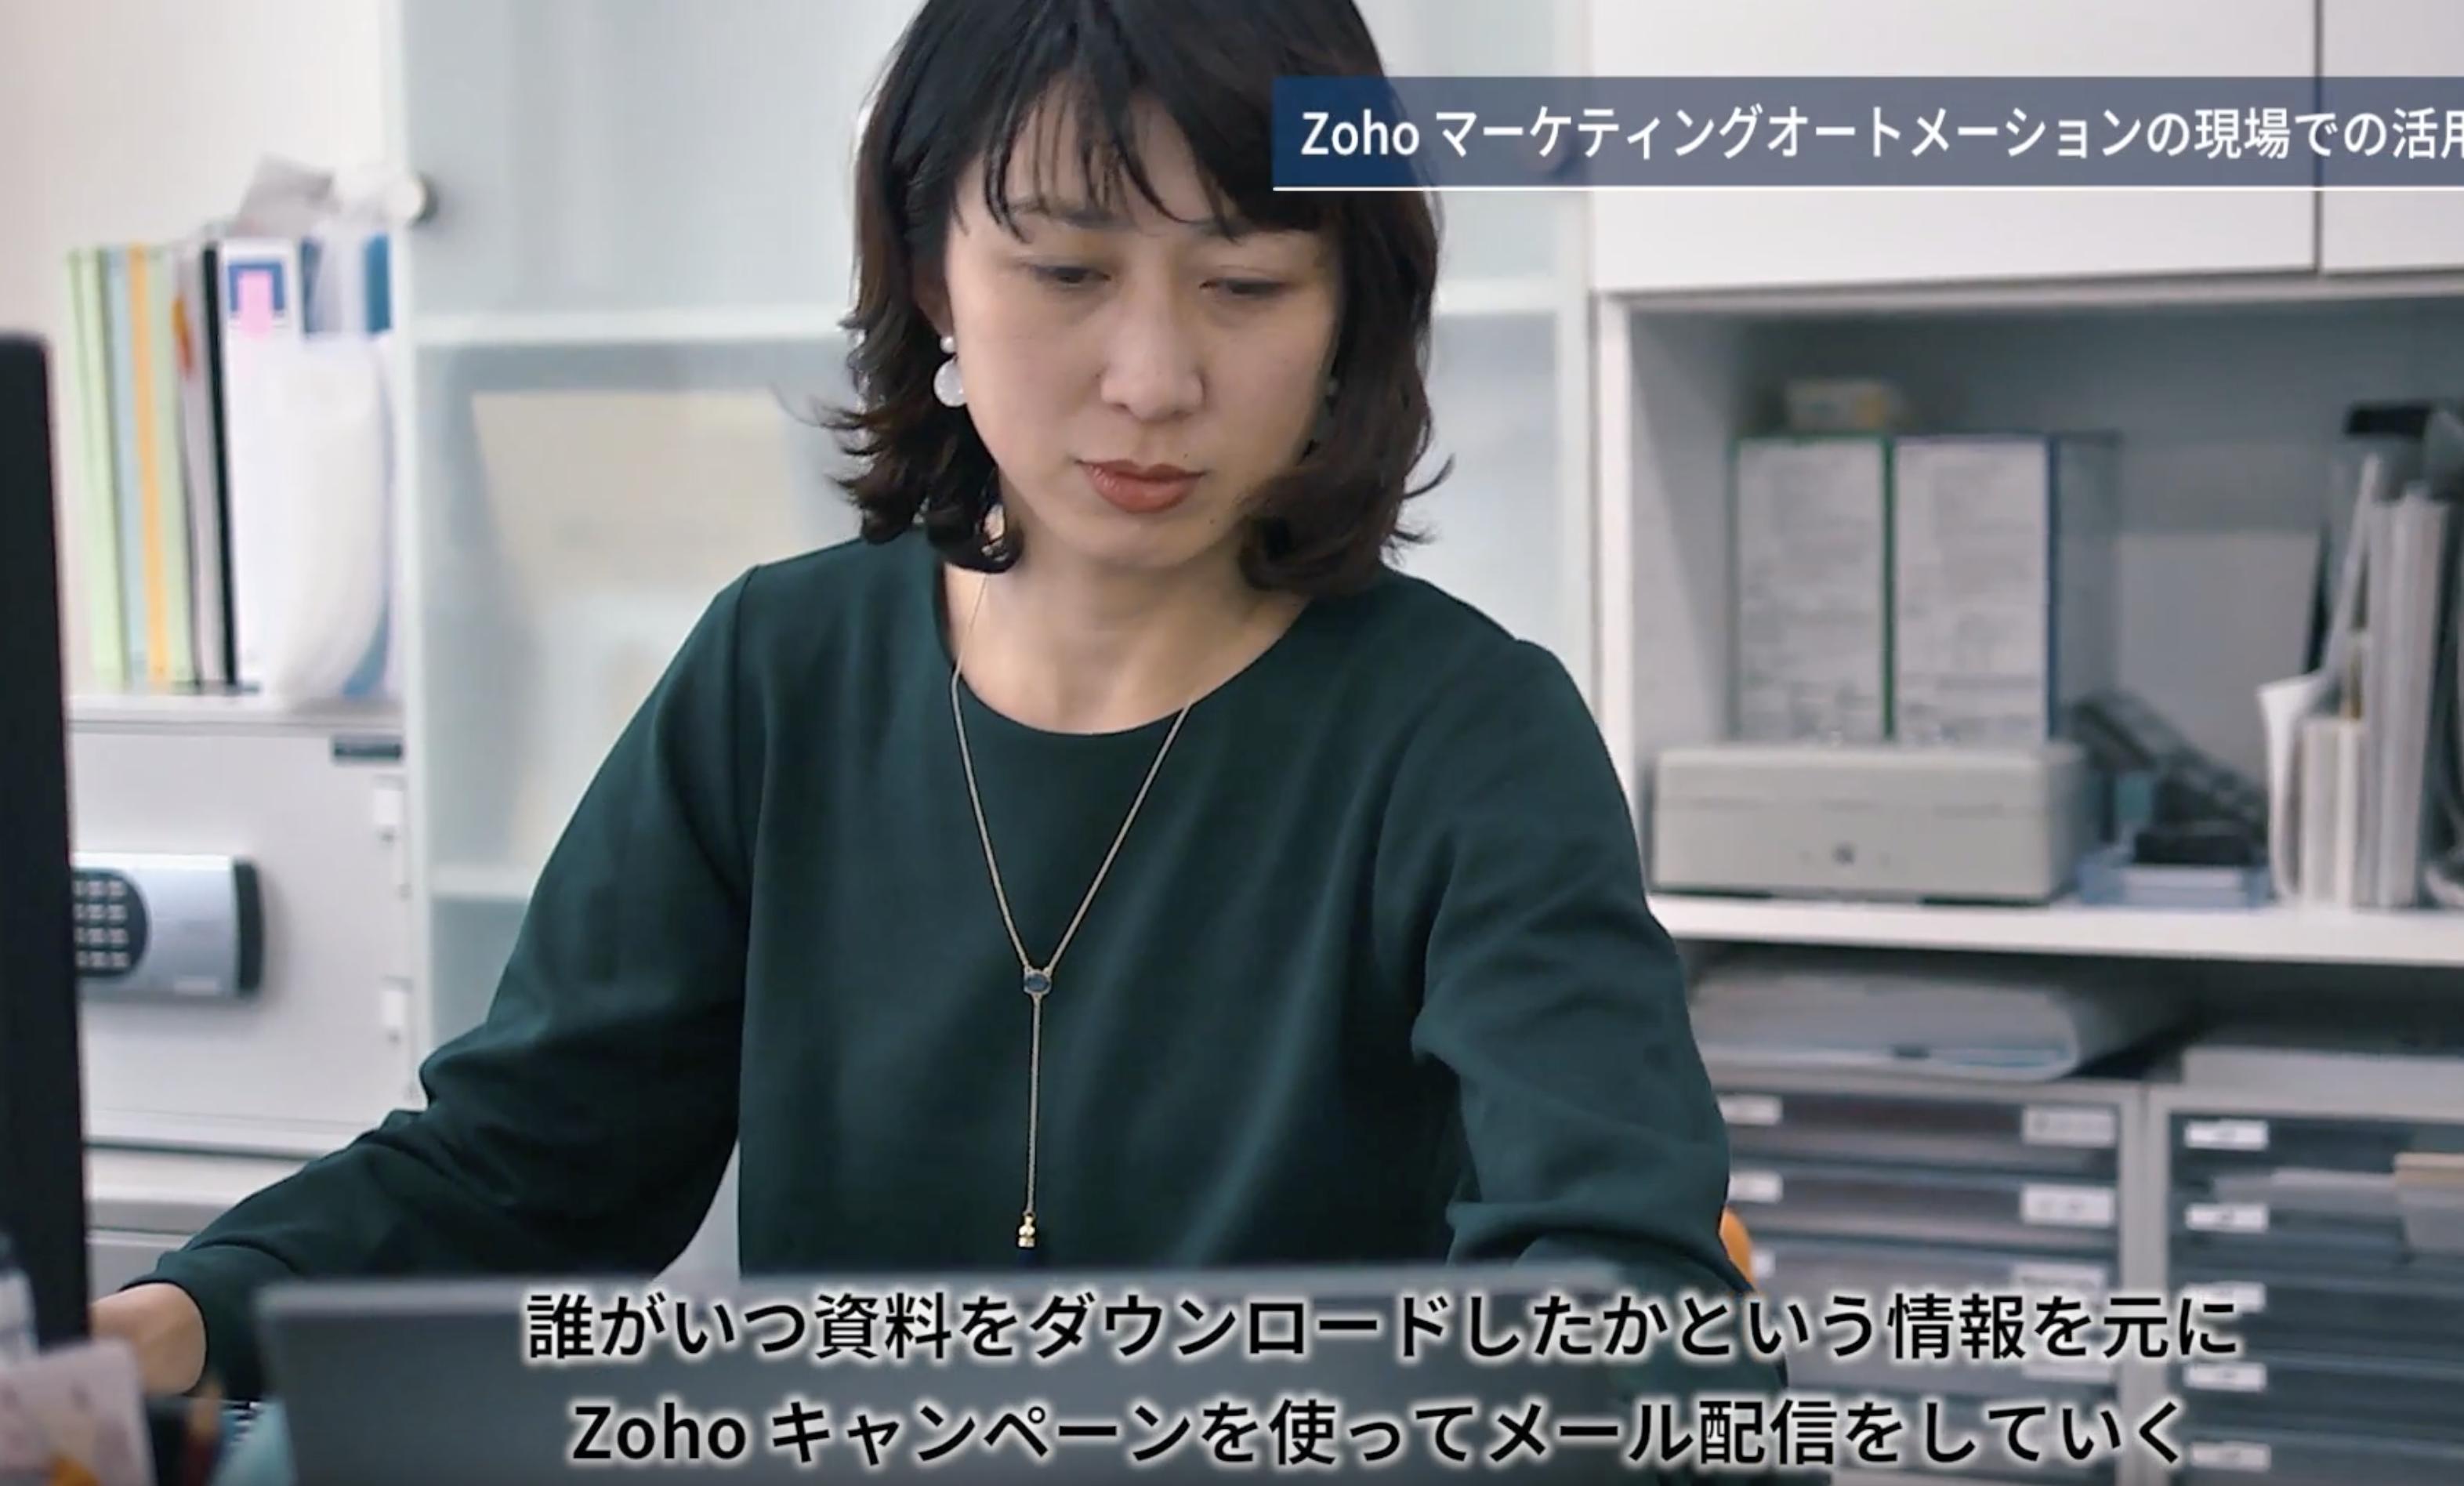 【Zoho マーケティングオートメーション 導入企業インタビュー】株式会社ジーニアスウェブ